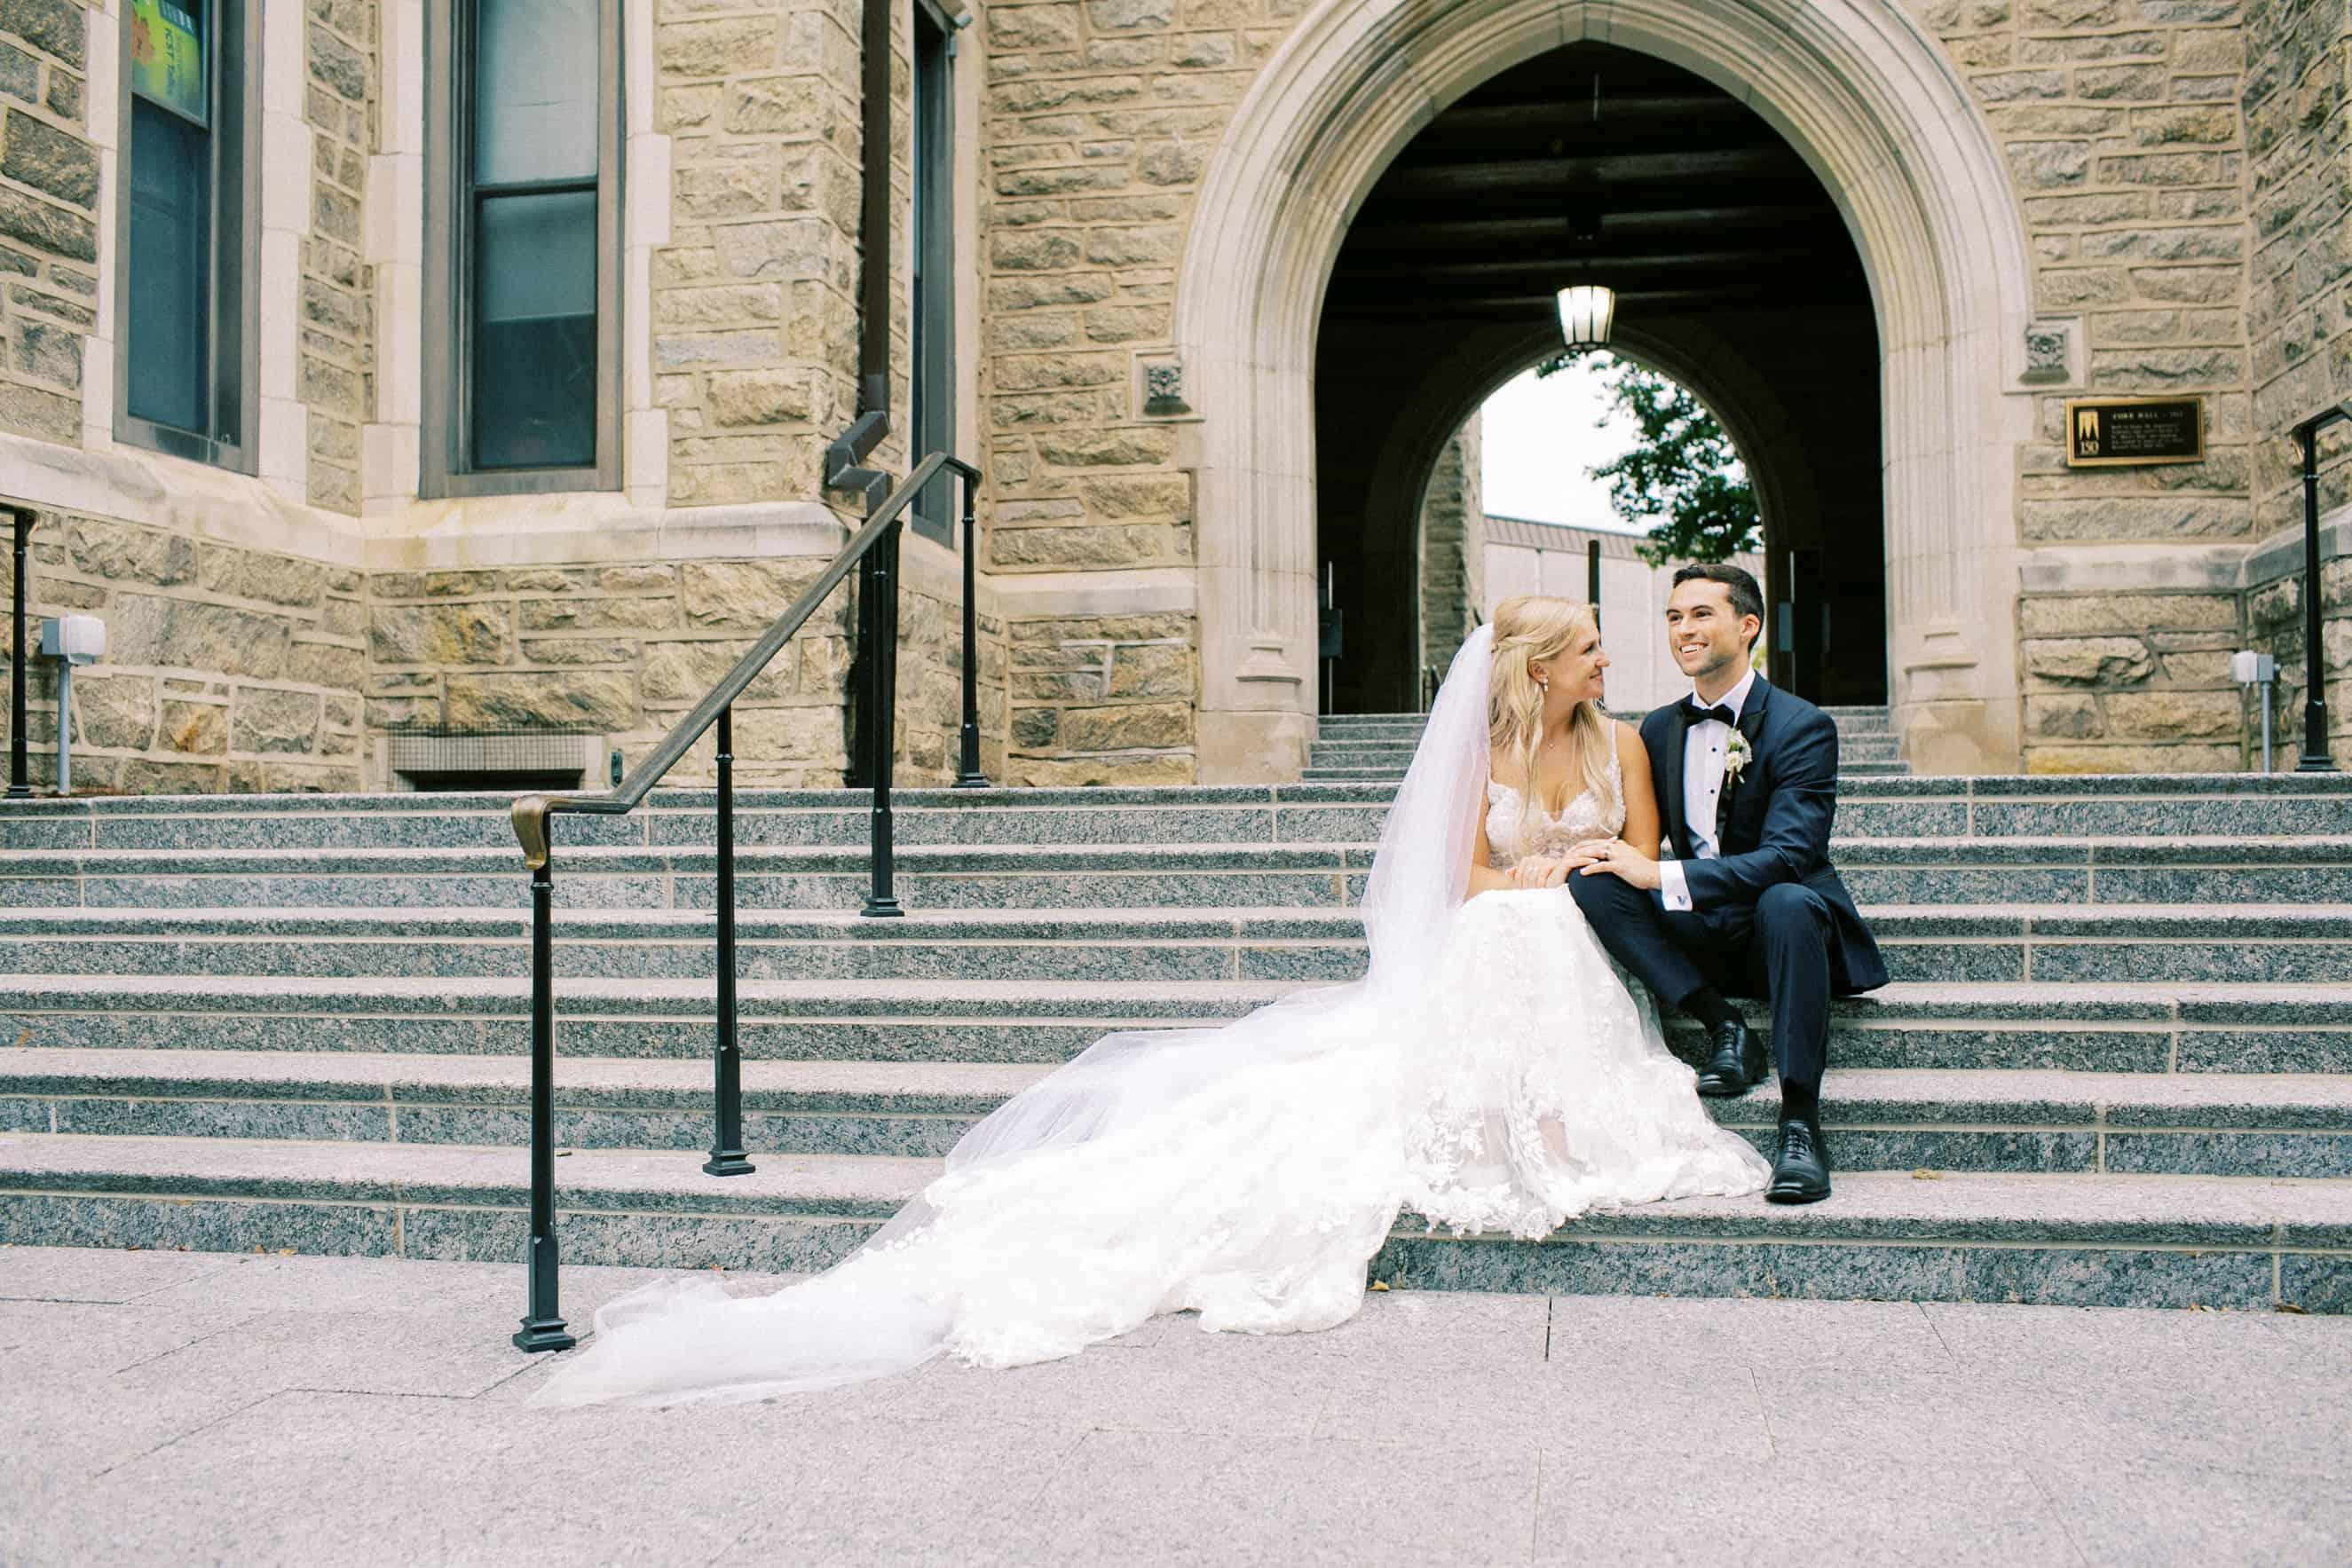 Wedding photography on campus at Villanova